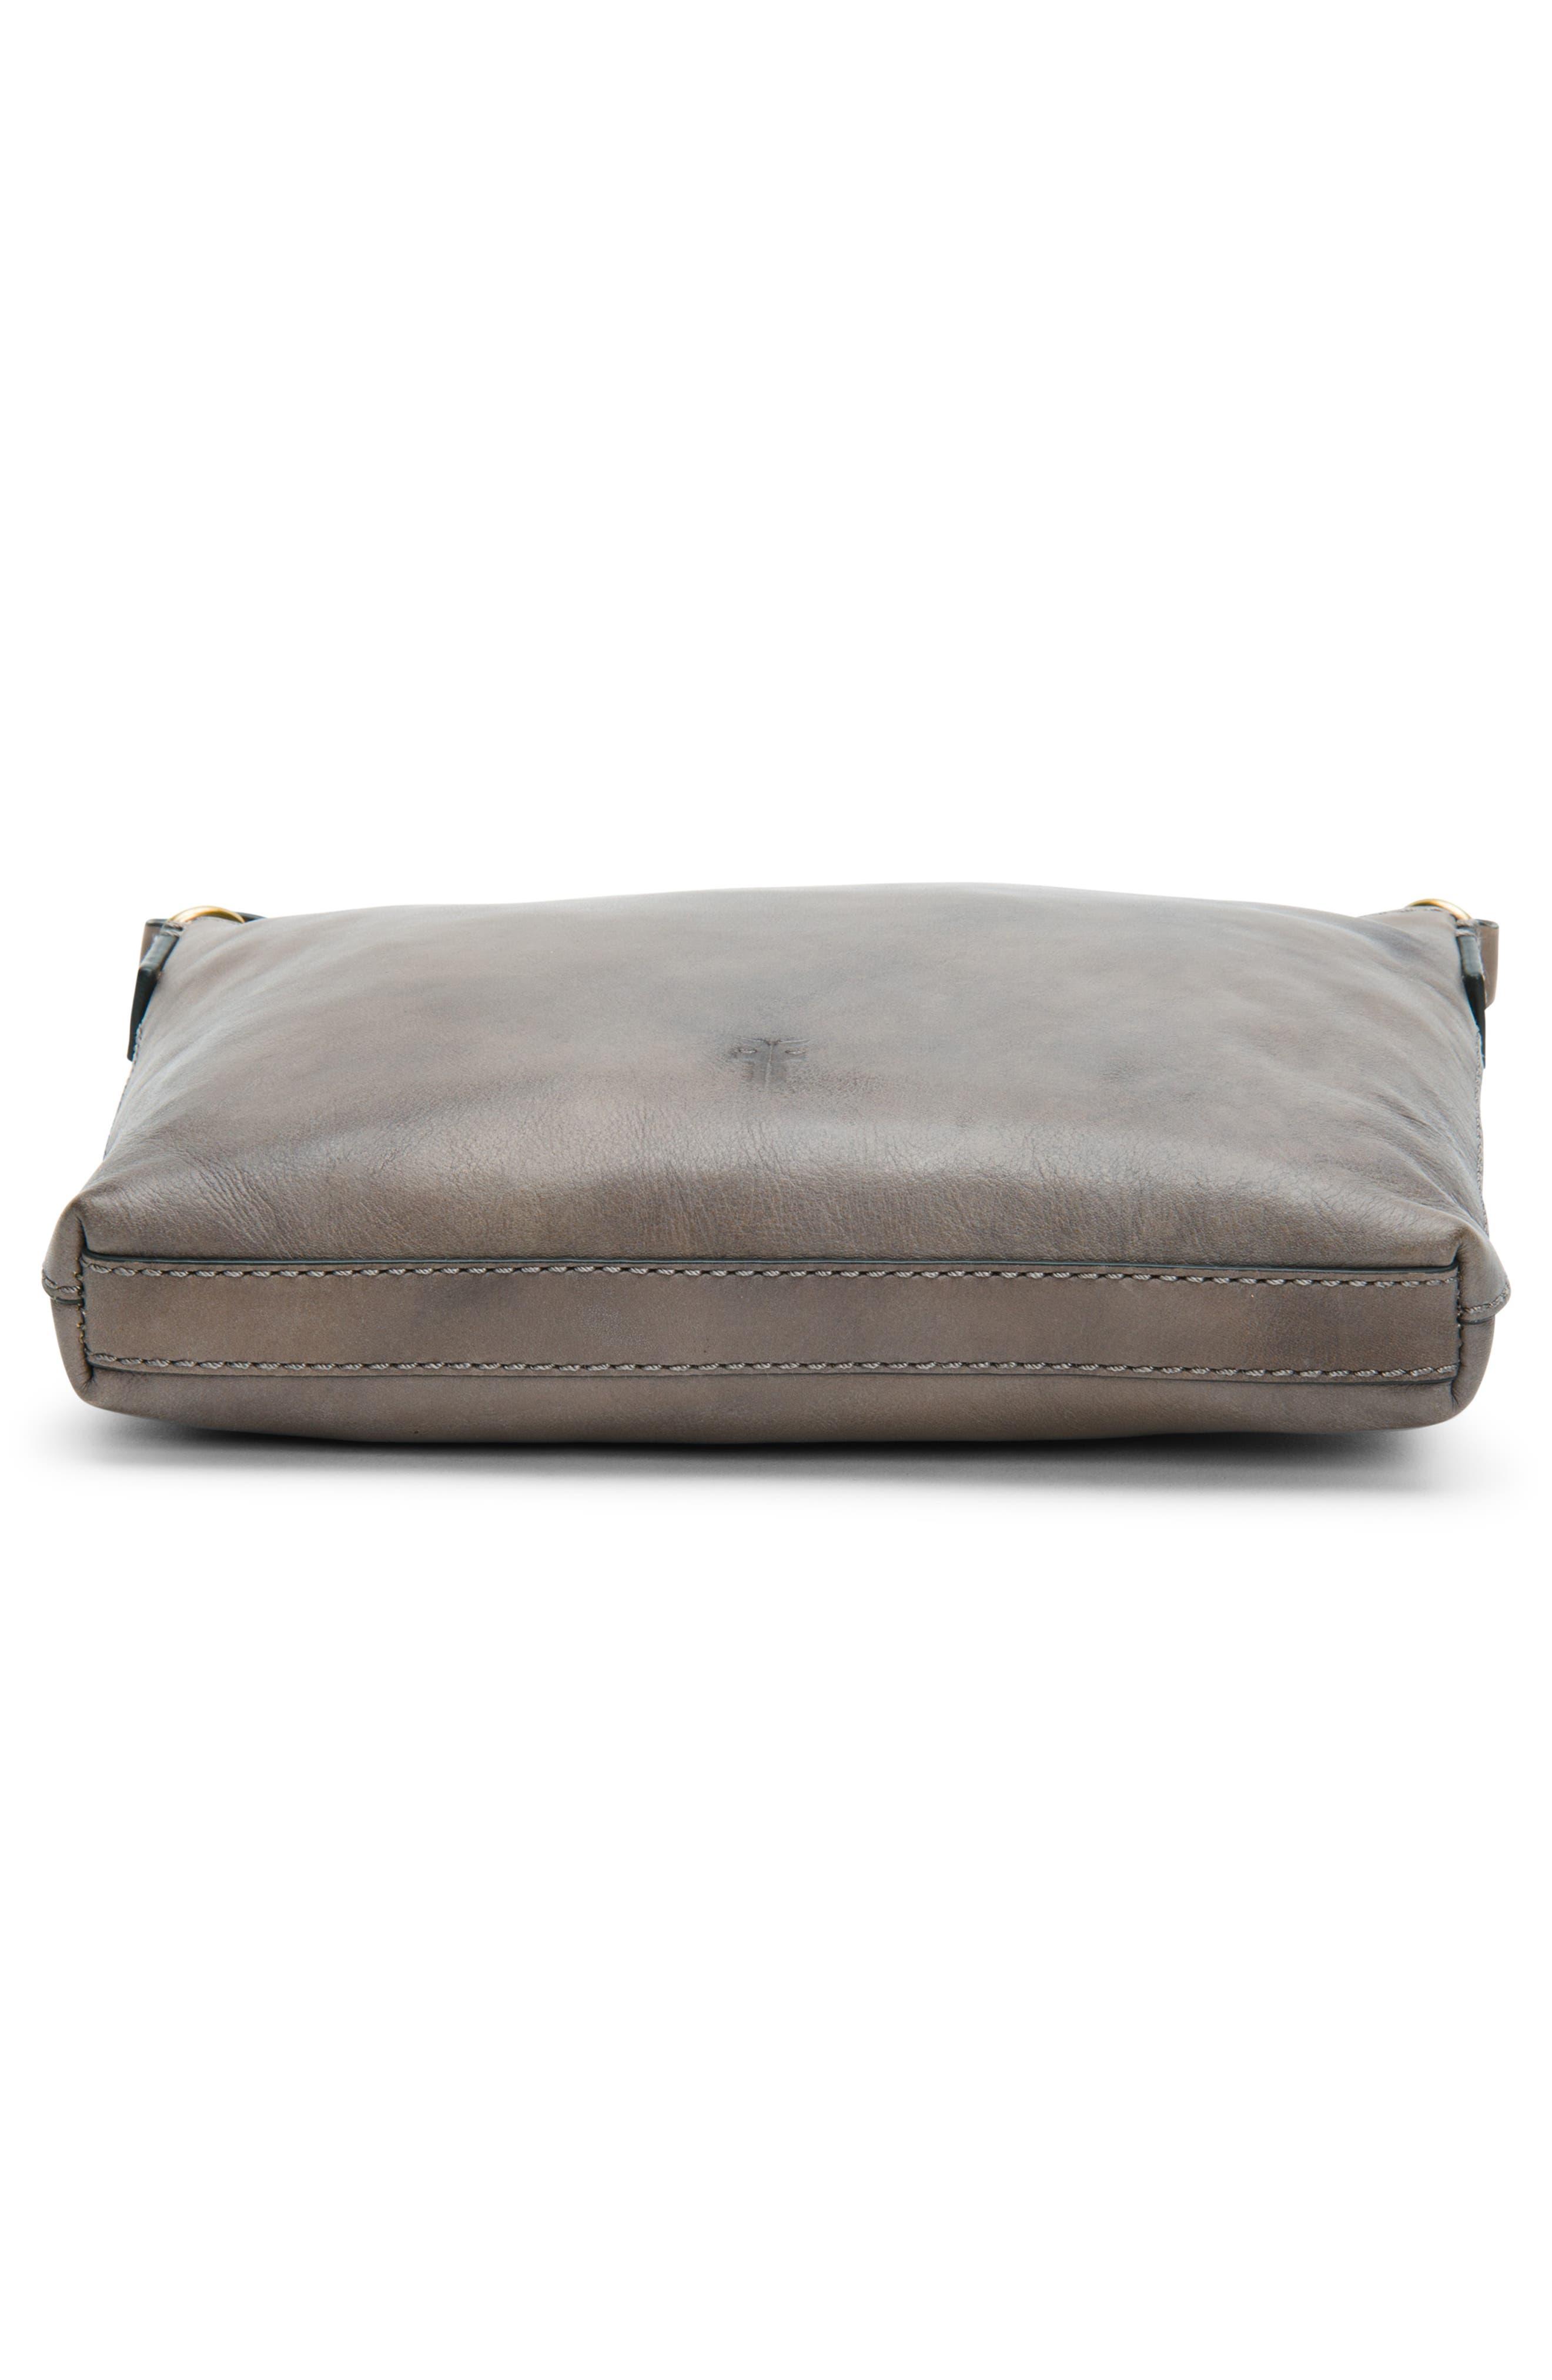 Carson Leather Crossbody Bag,                             Alternate thumbnail 6, color,                             030